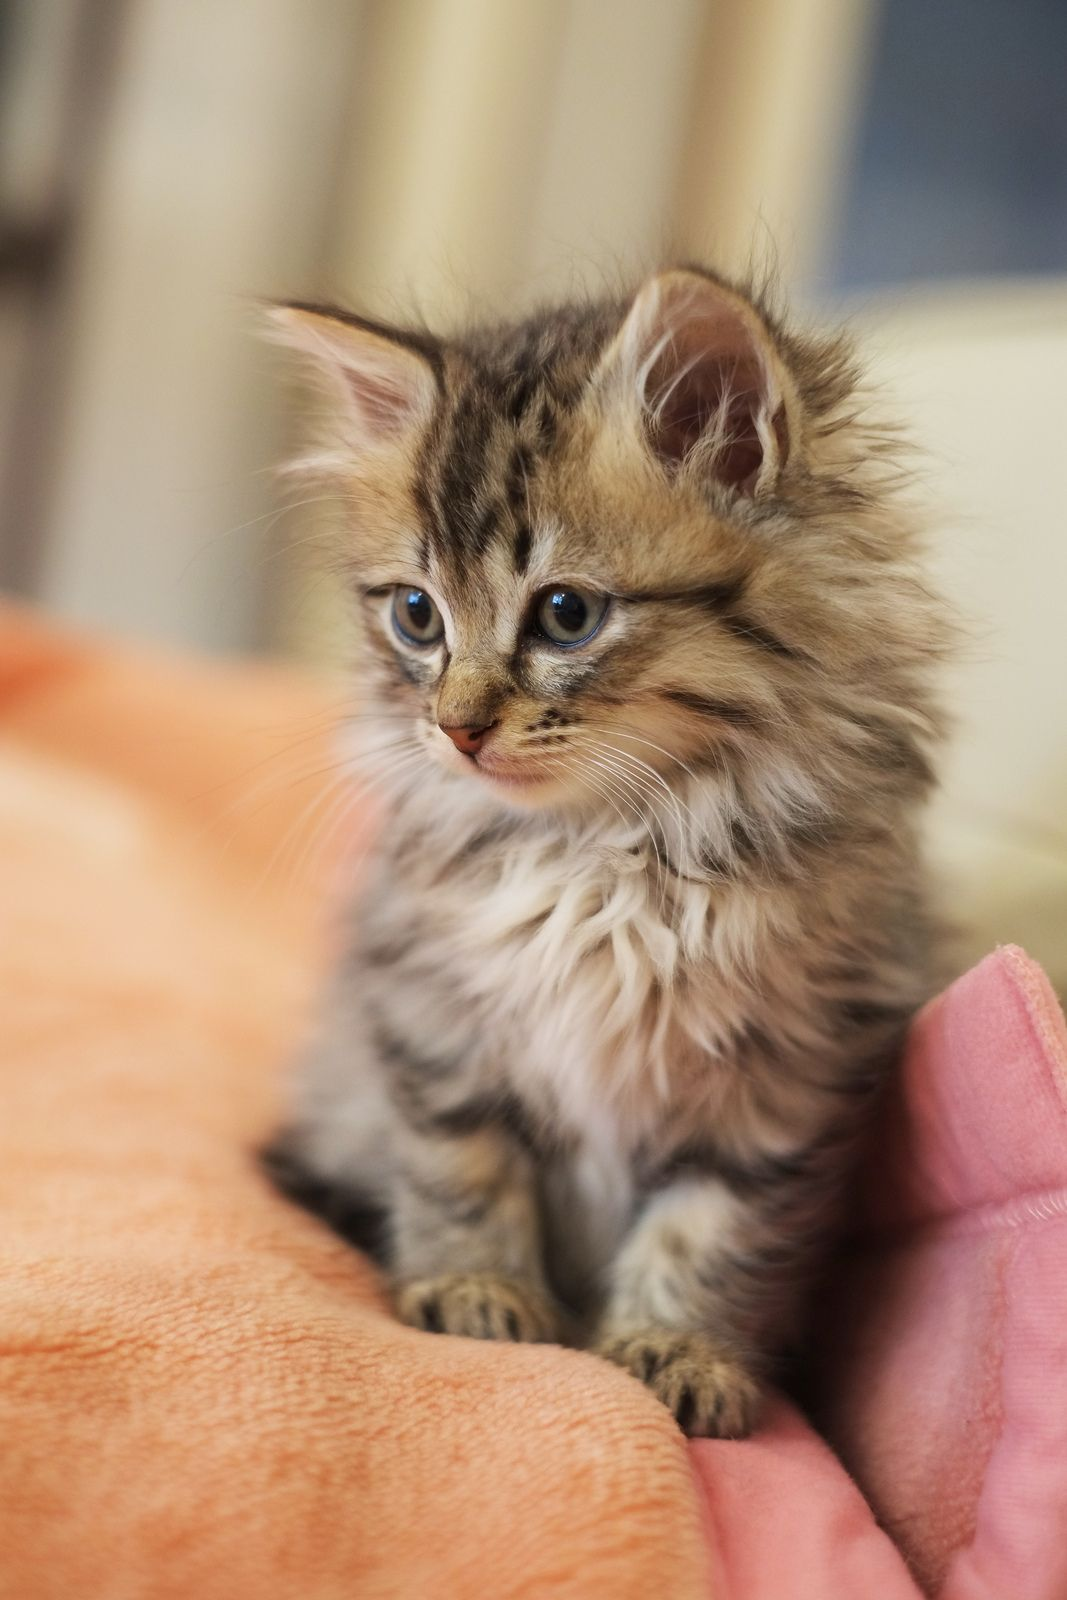 Épinglé par Josephine Mary Maynard sur Baby animals   Pinterest ... 44fb97289033